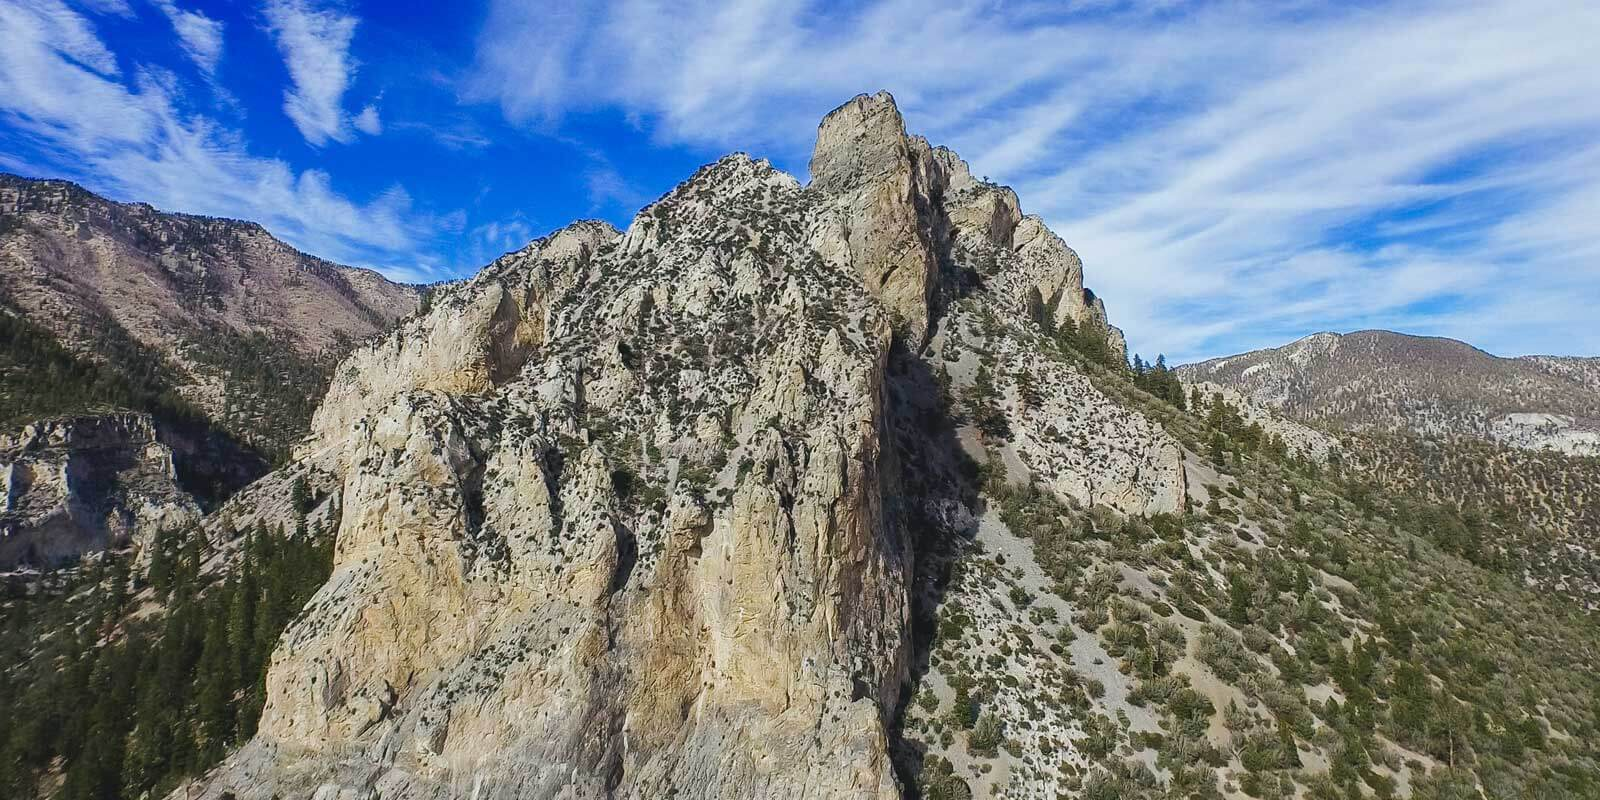 Landscape photo of Mount Charleston in Nevada